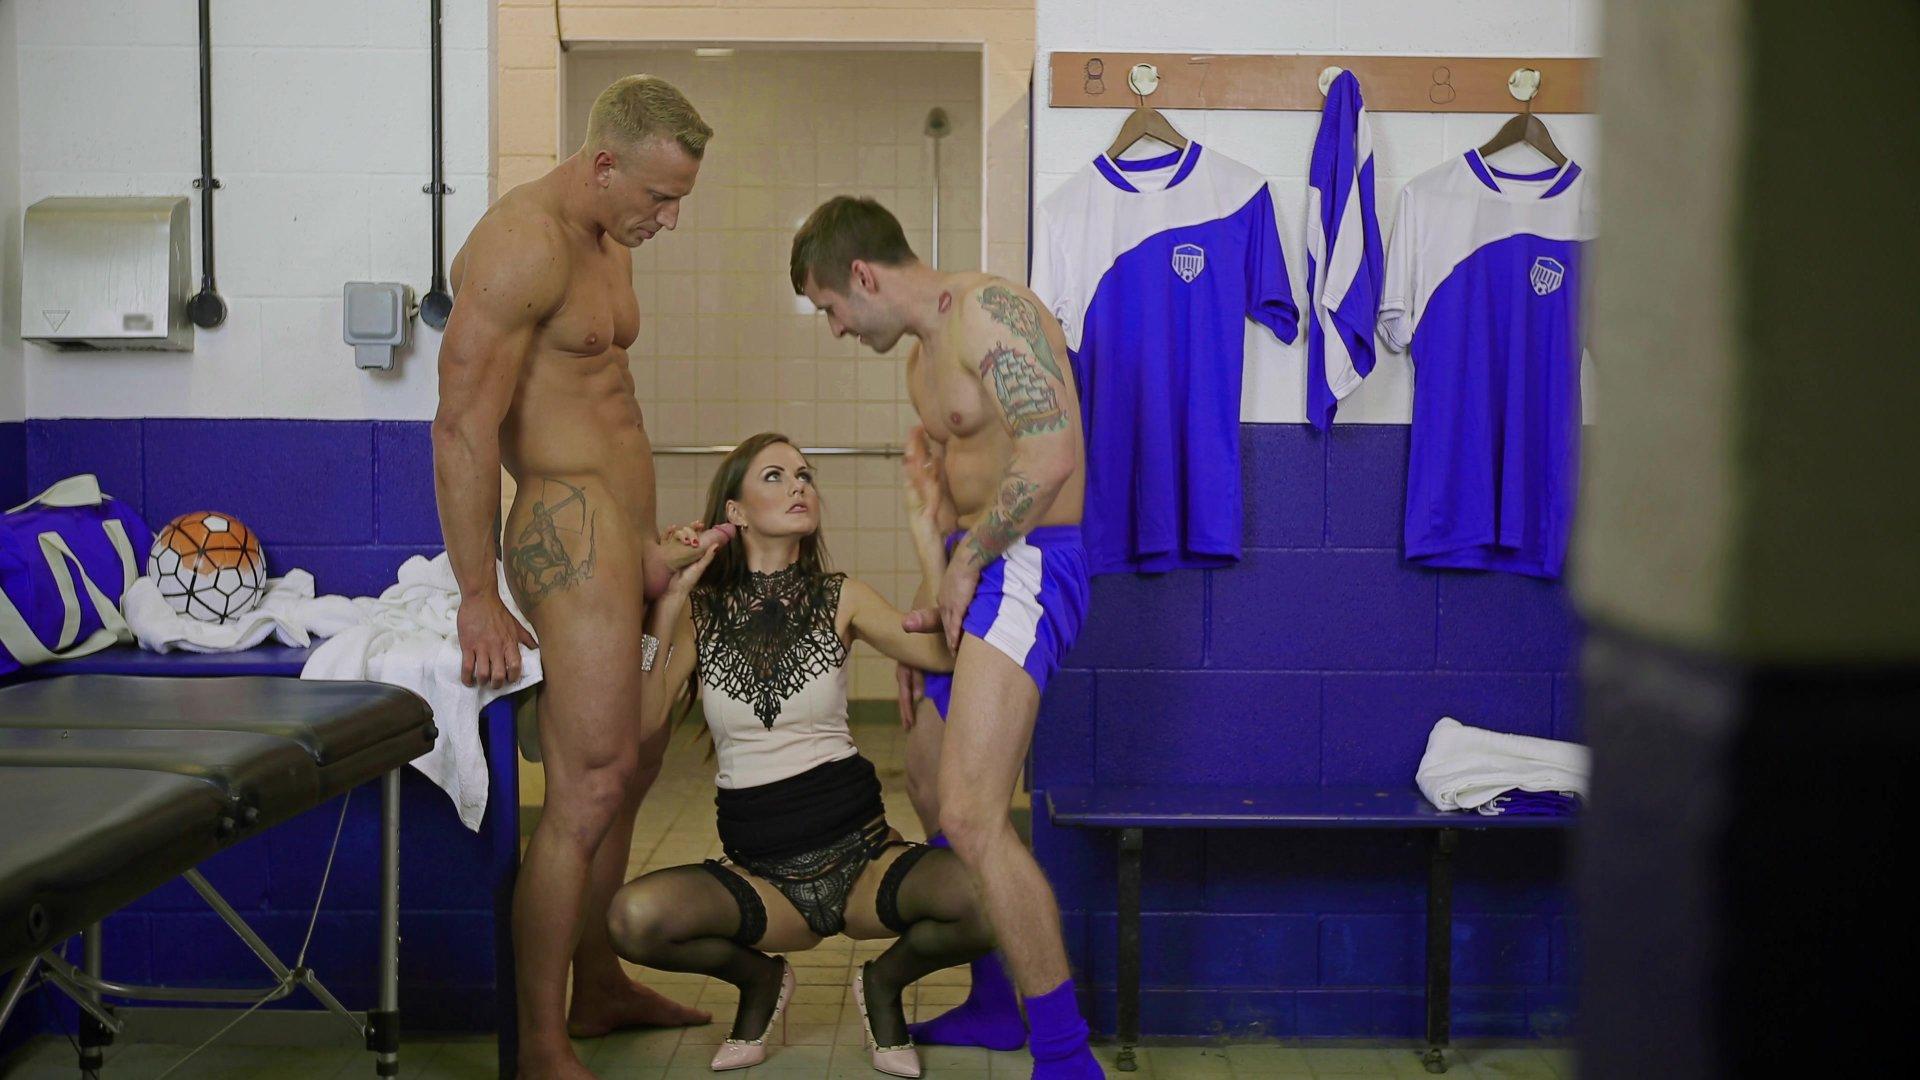 aftermatch locker room gay porn